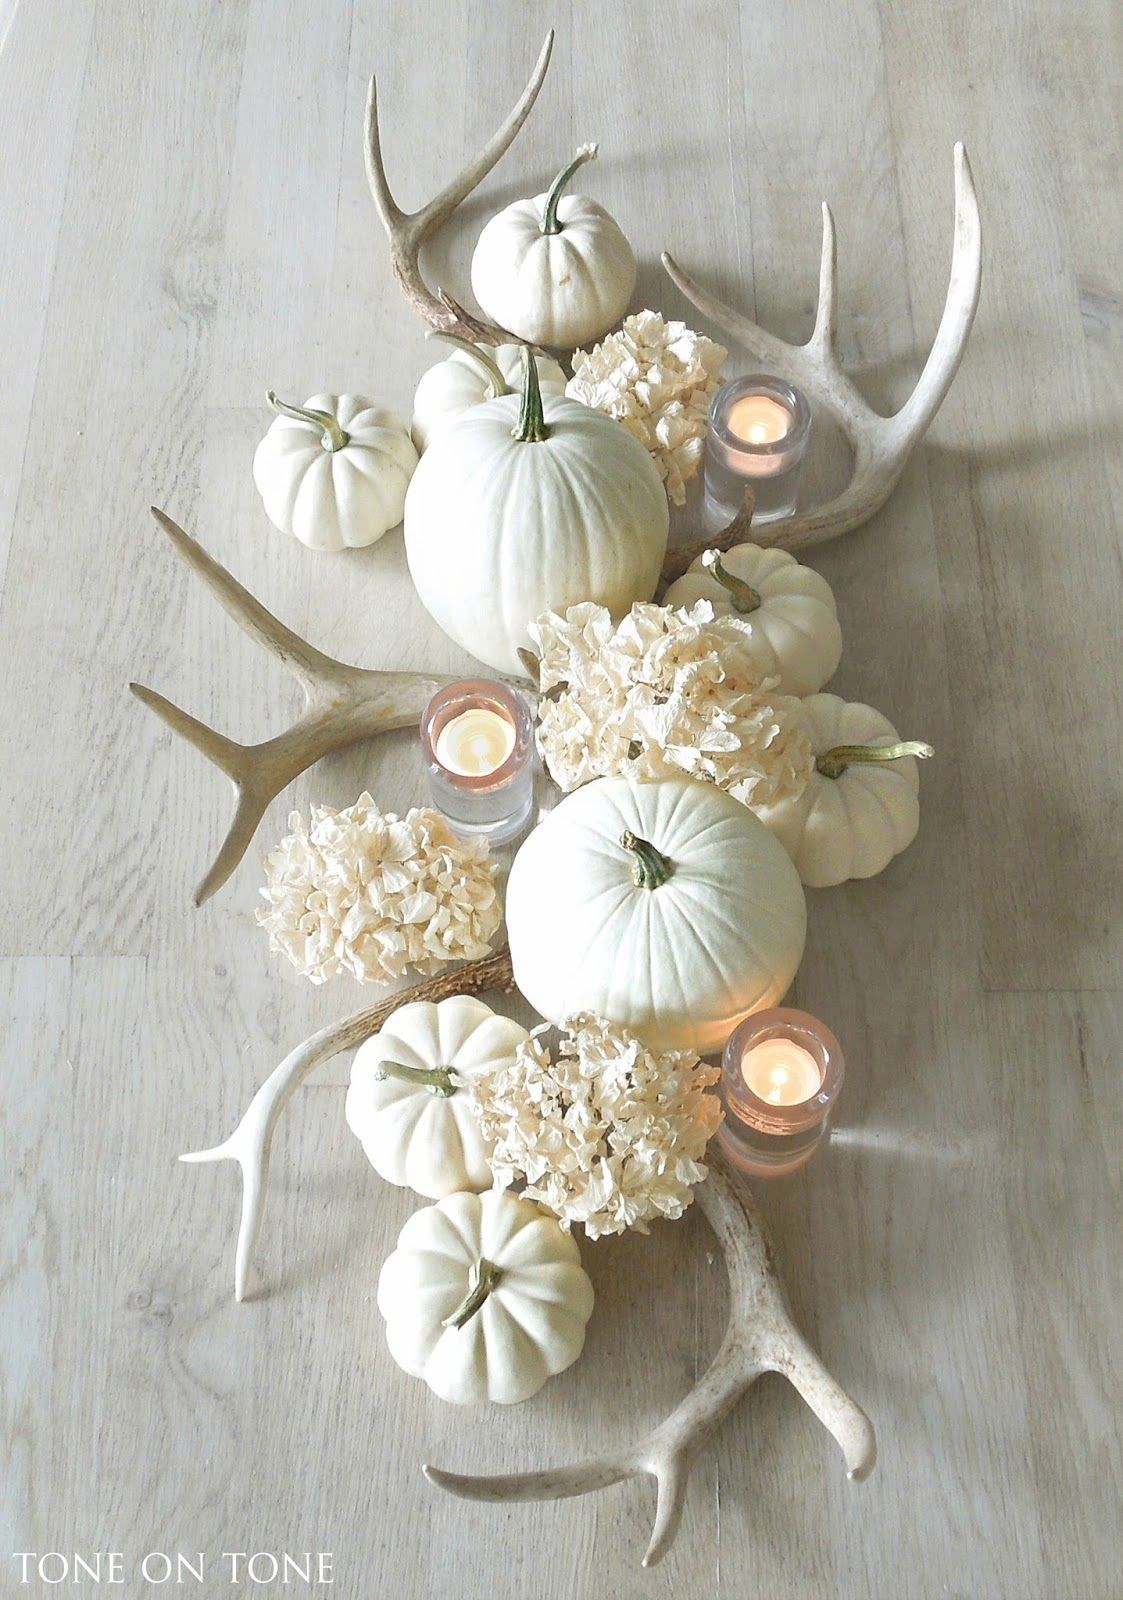 Diy Fall Centerpiece Ideas To Pumpkin Spice Up Your Decor